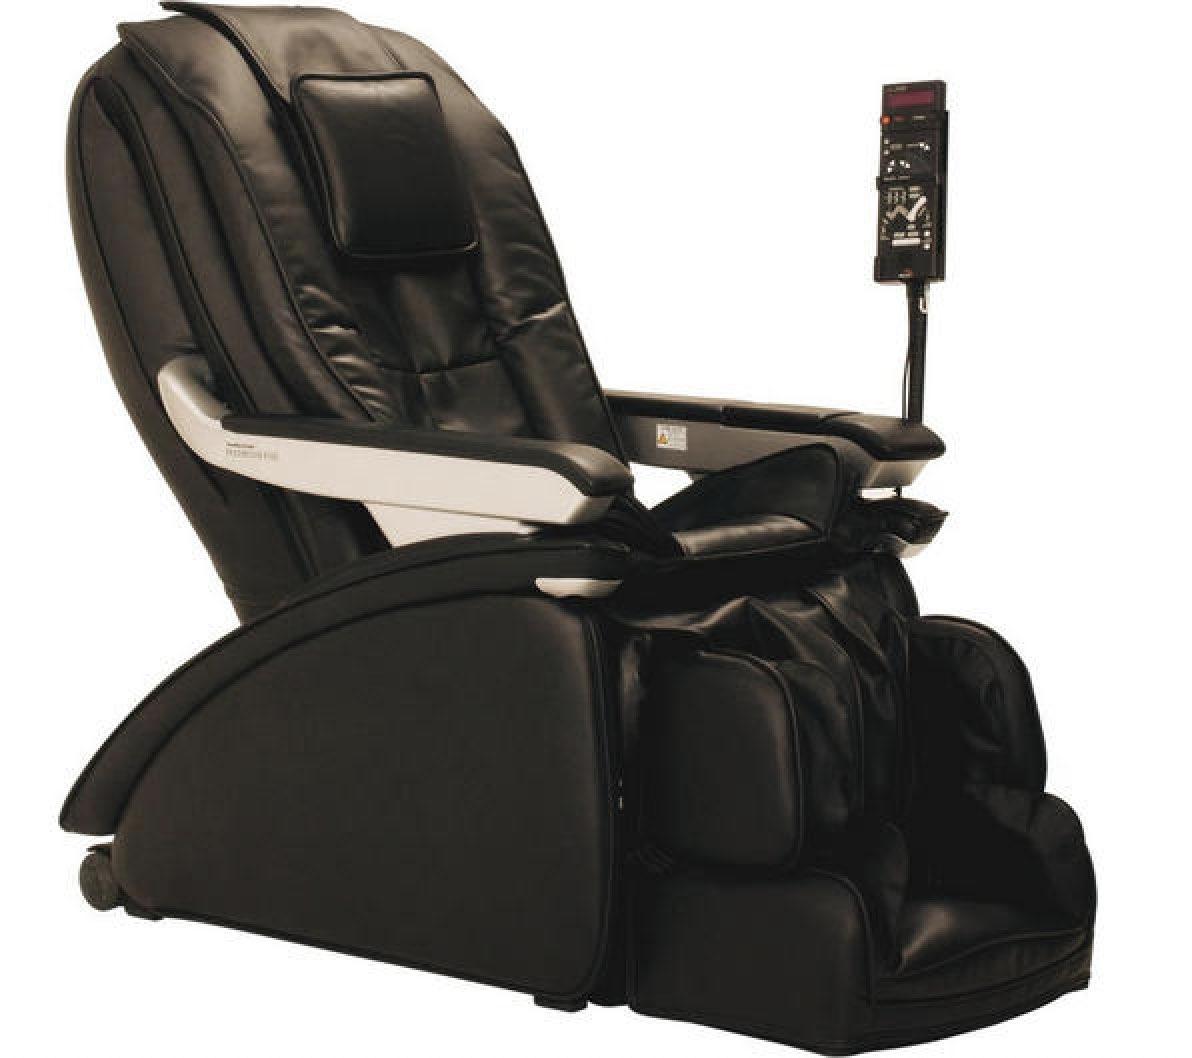 Fauteuil de Massage Inada D6 Robostic 5